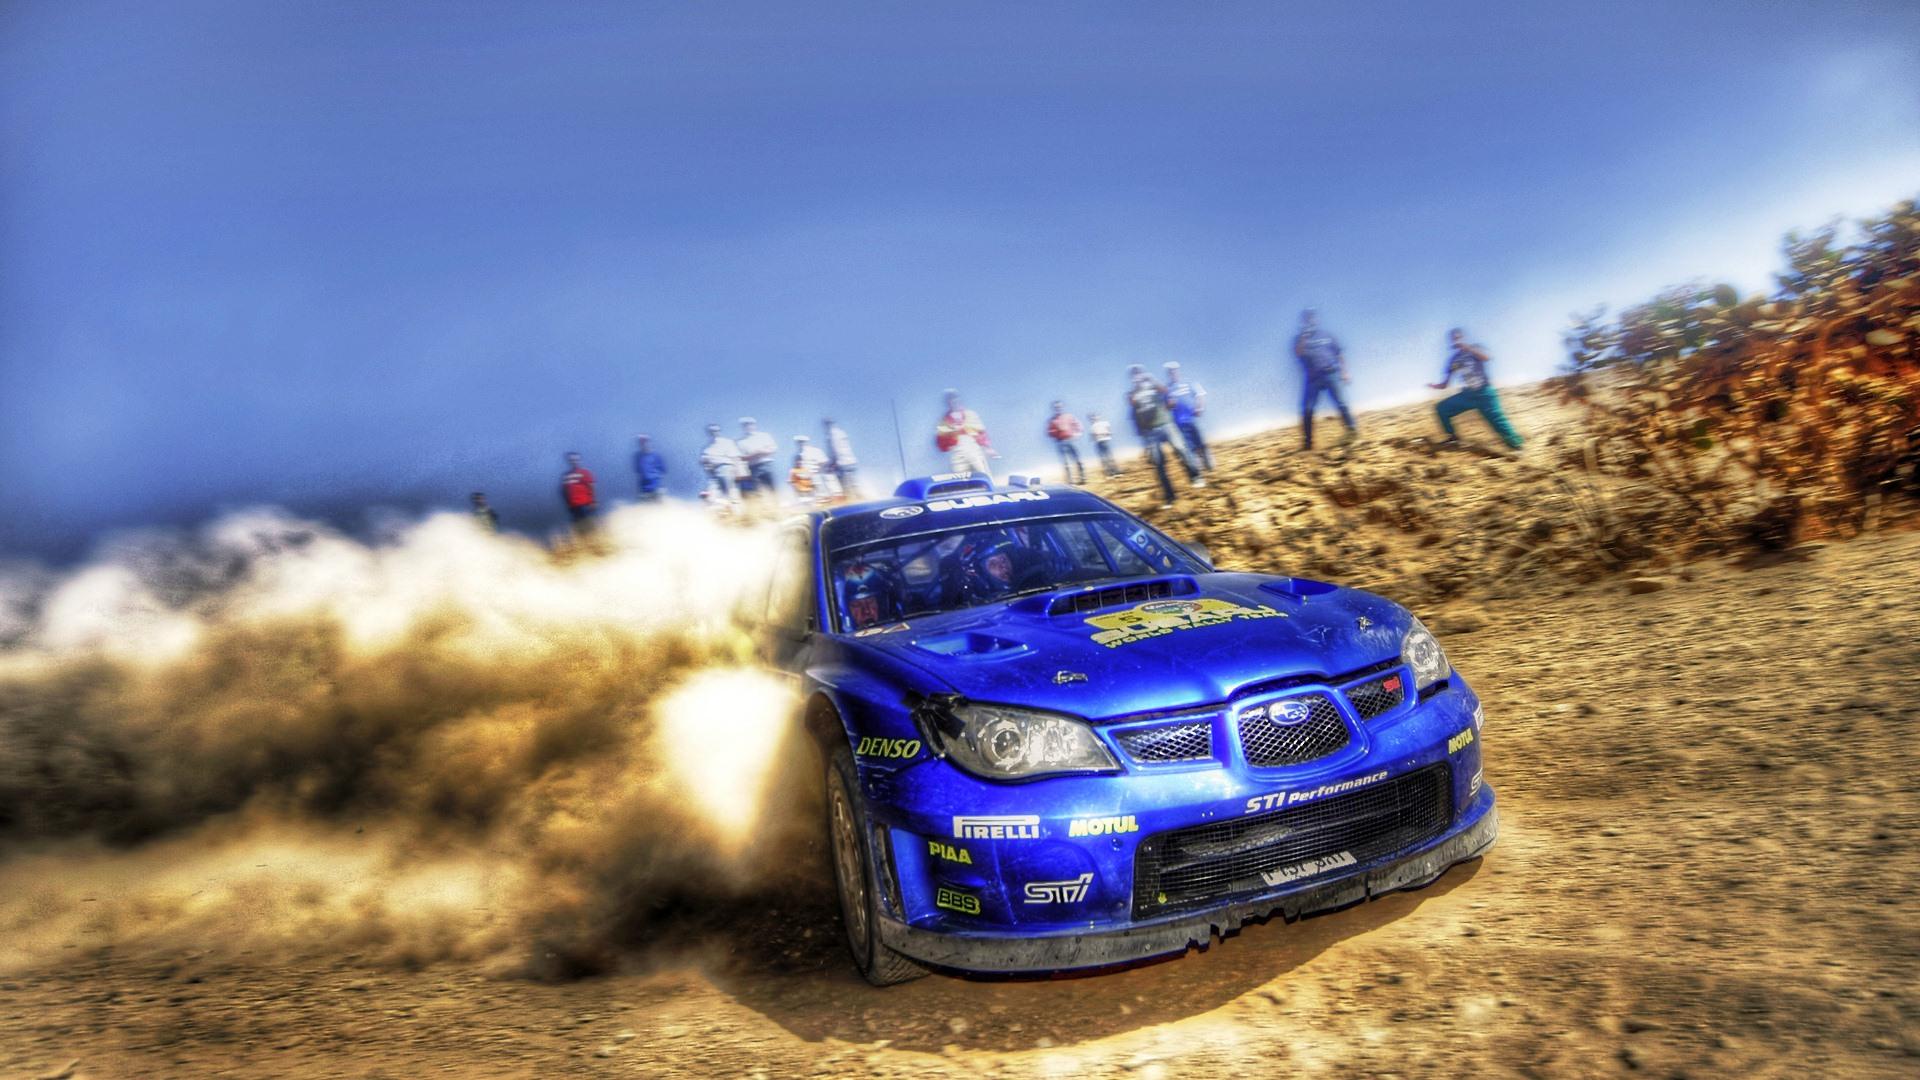 amazing rally car wallpaper 33289